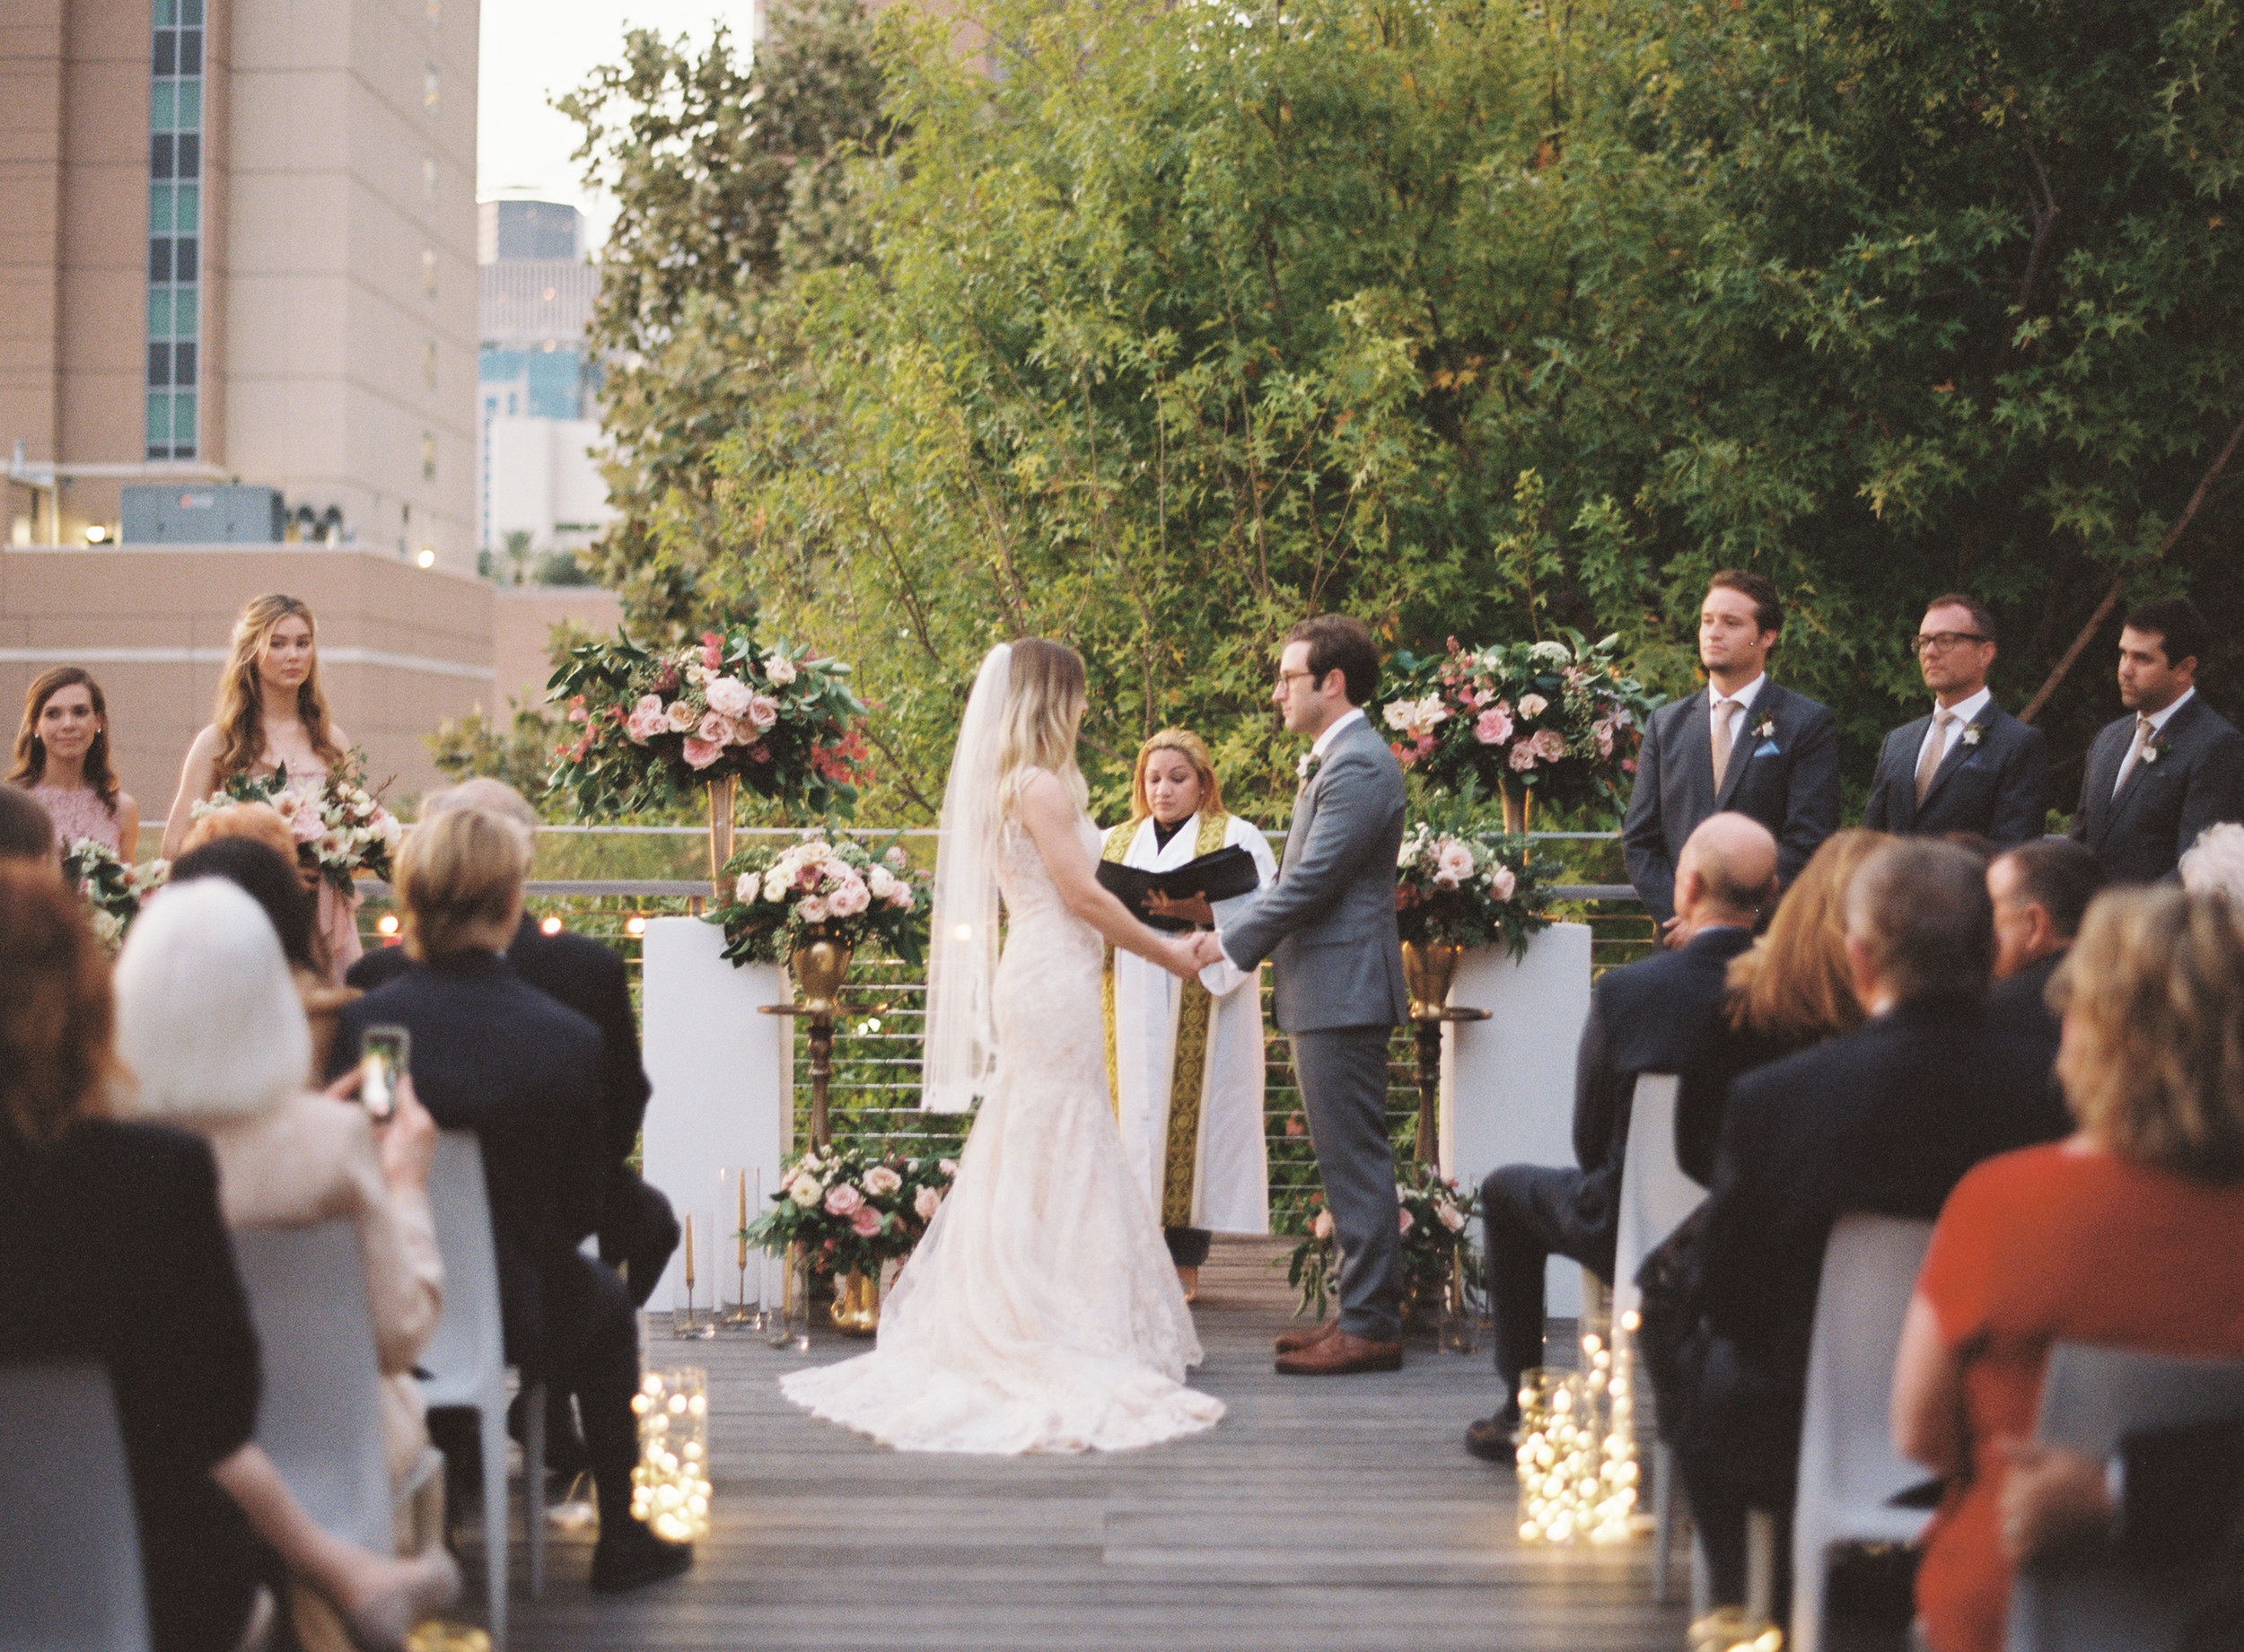 237-KATIE_GARY_WEDDING_FILM.jpg